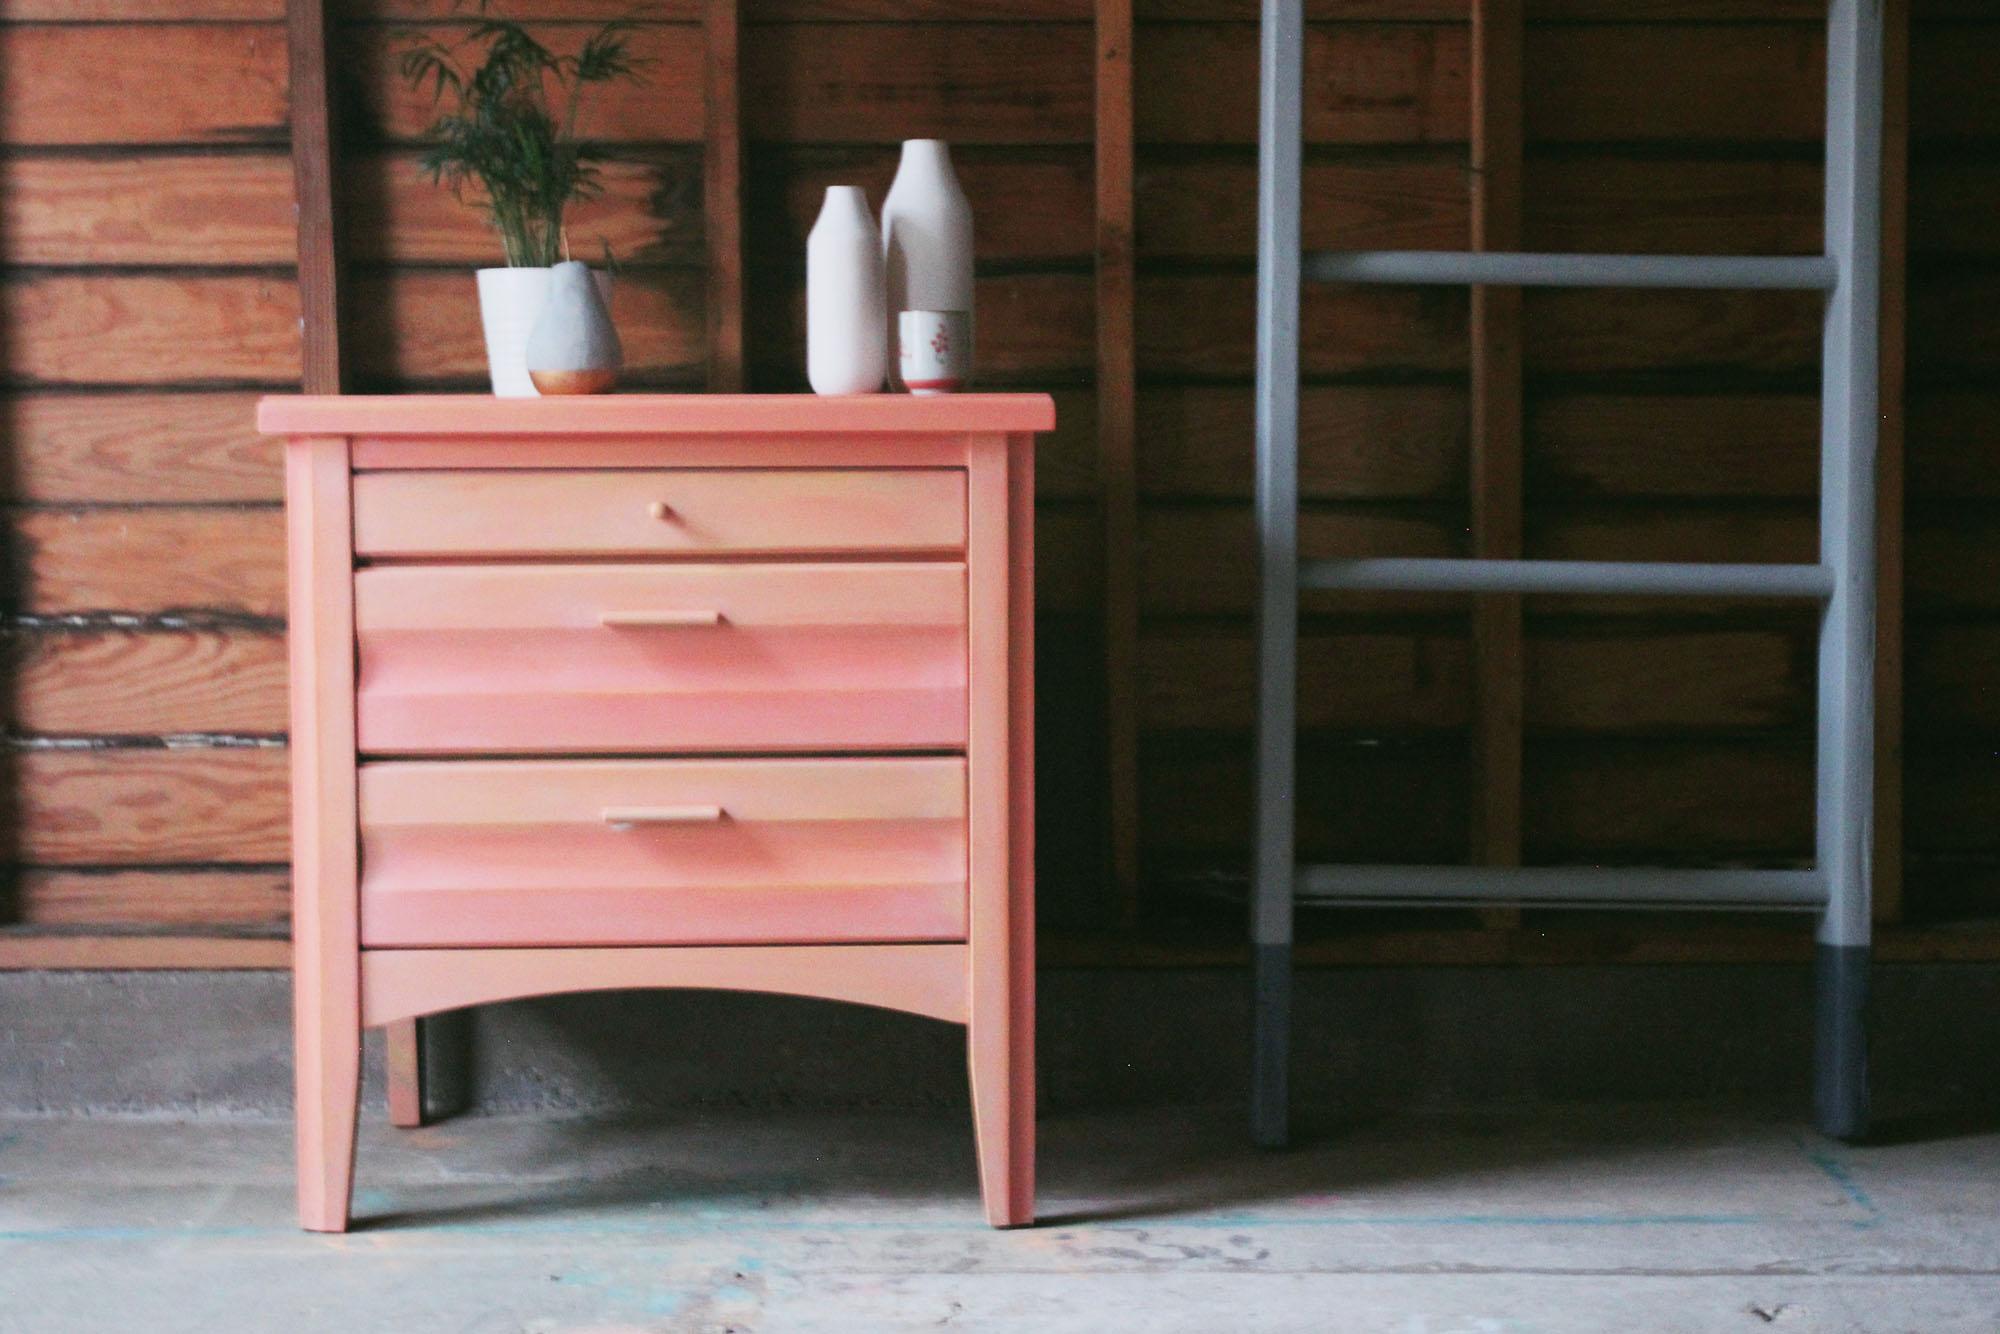 a-simpler-design-annie-sloan-sunset-ombre-dresser-coral-pinkjpg10.jpg